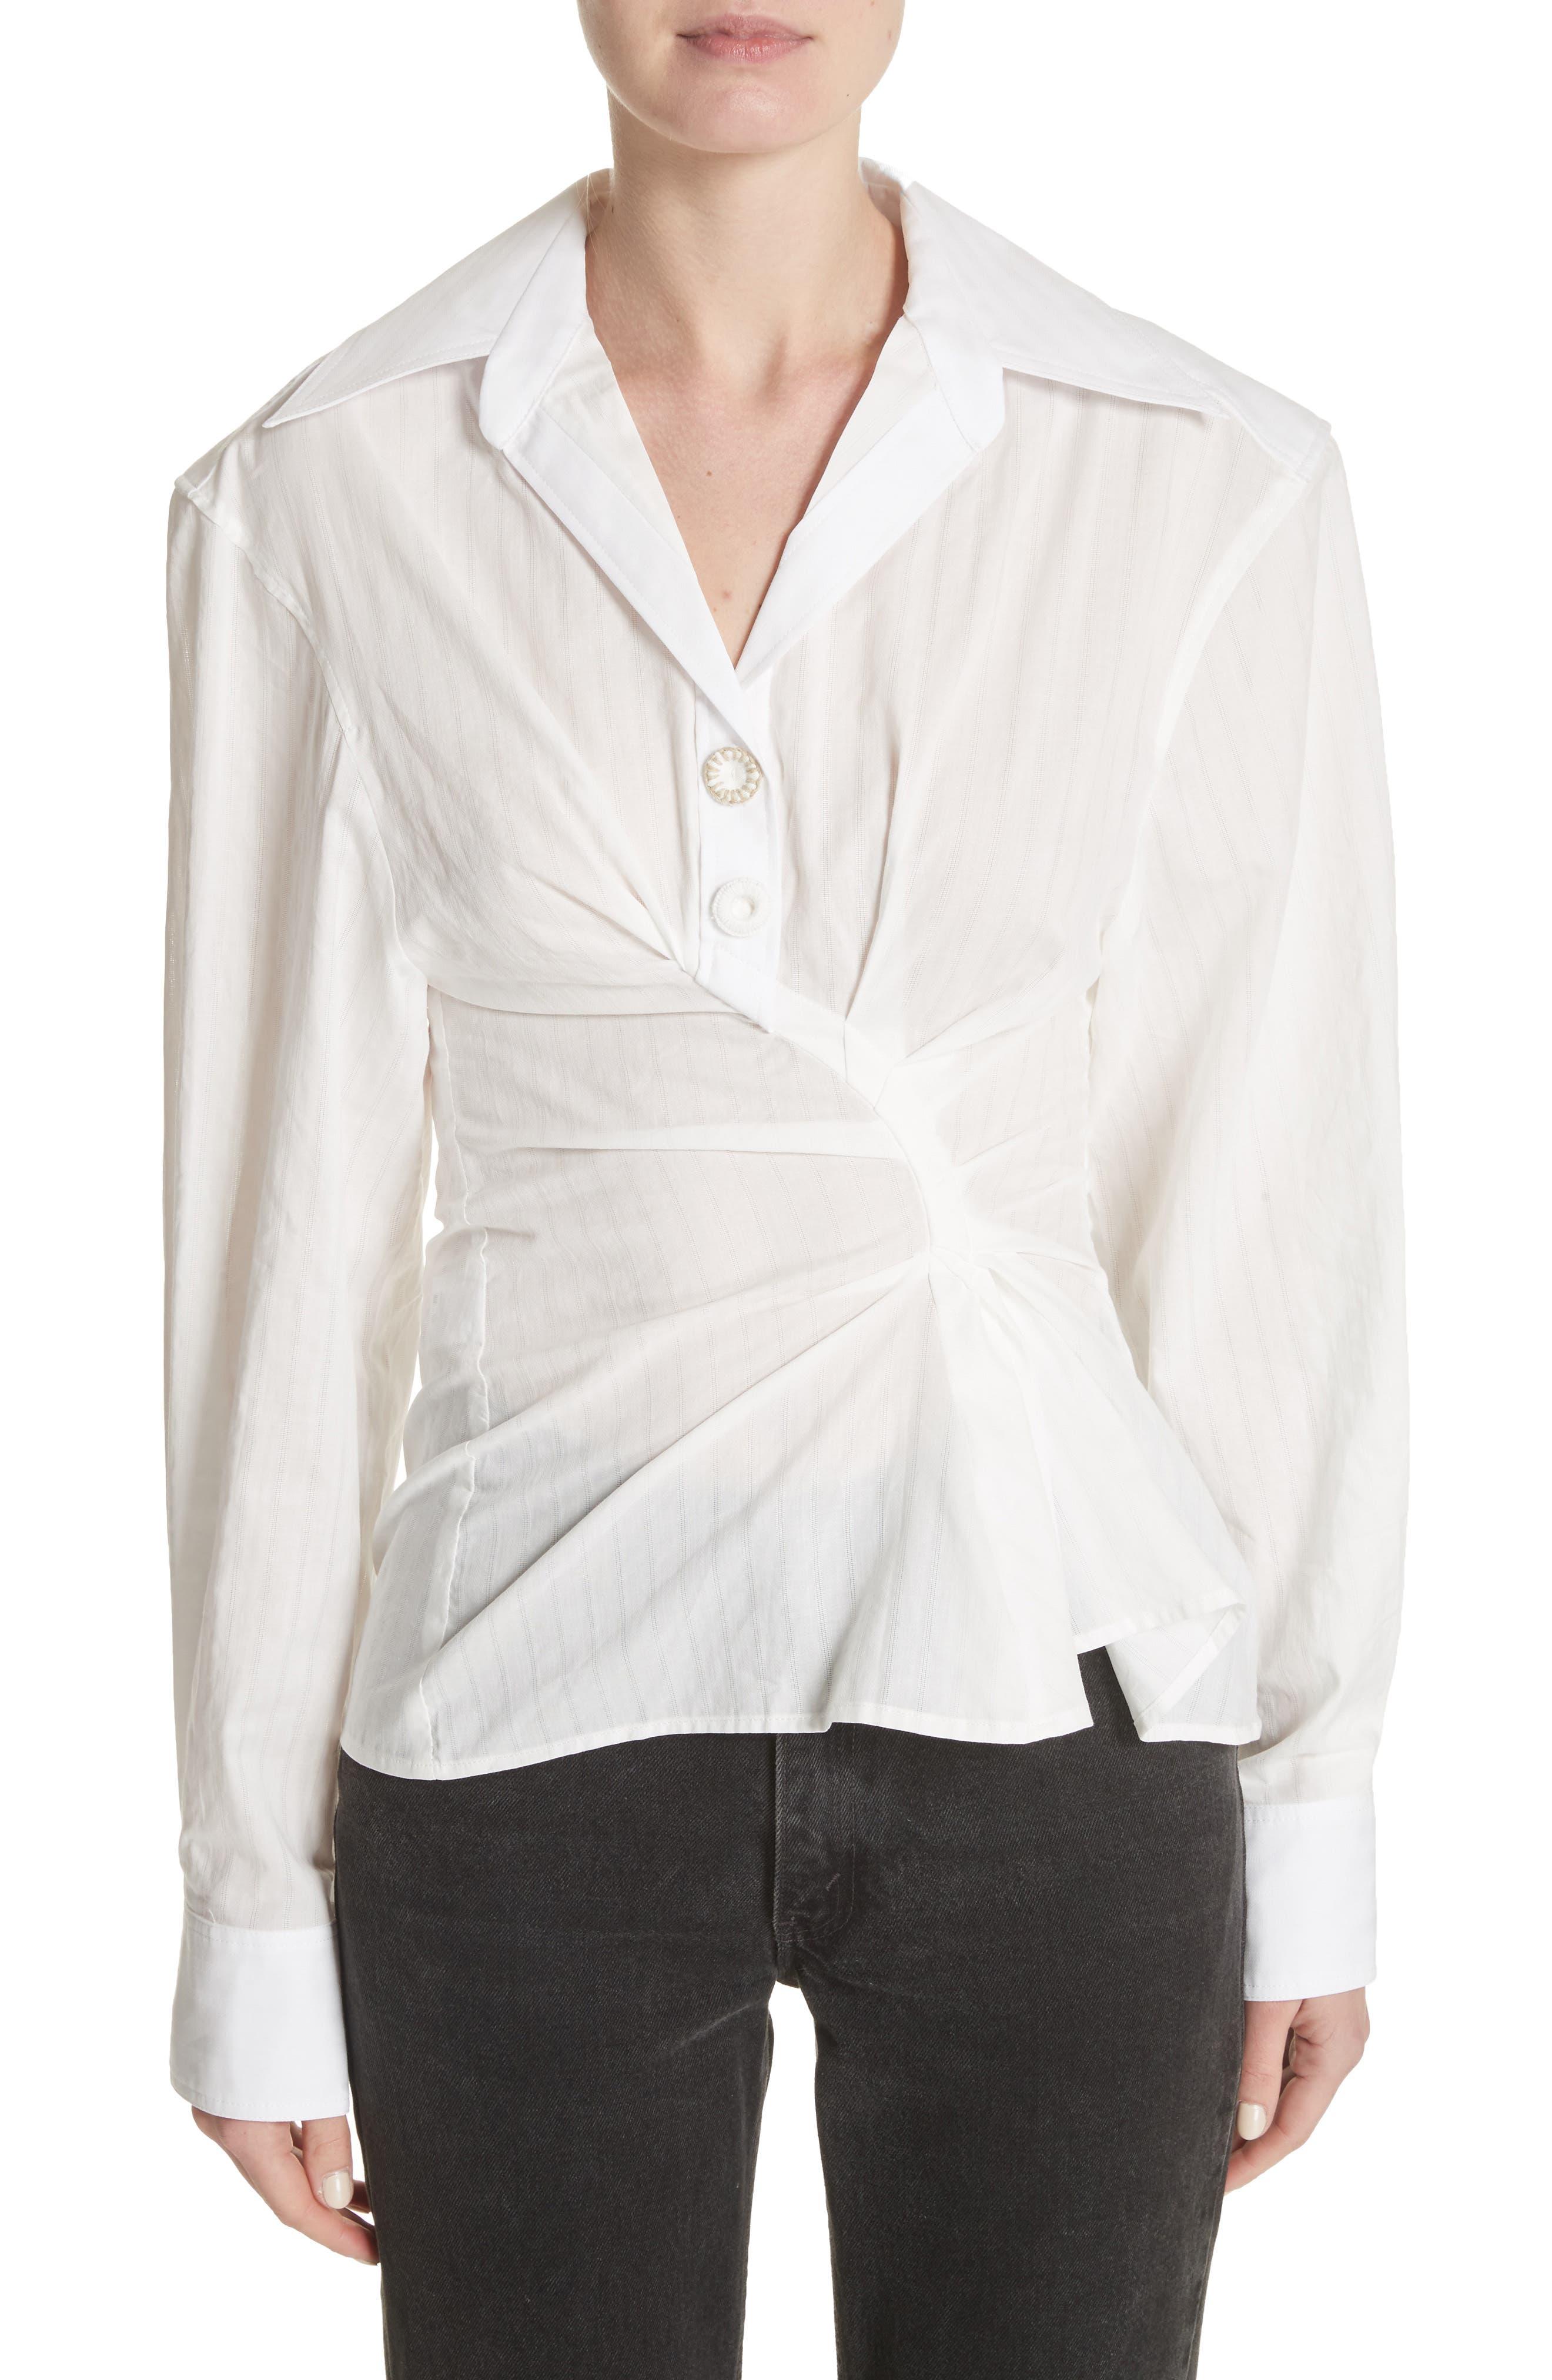 Alternate Image 1 Selected - Jacquemus La Chemise Maceio Shirt